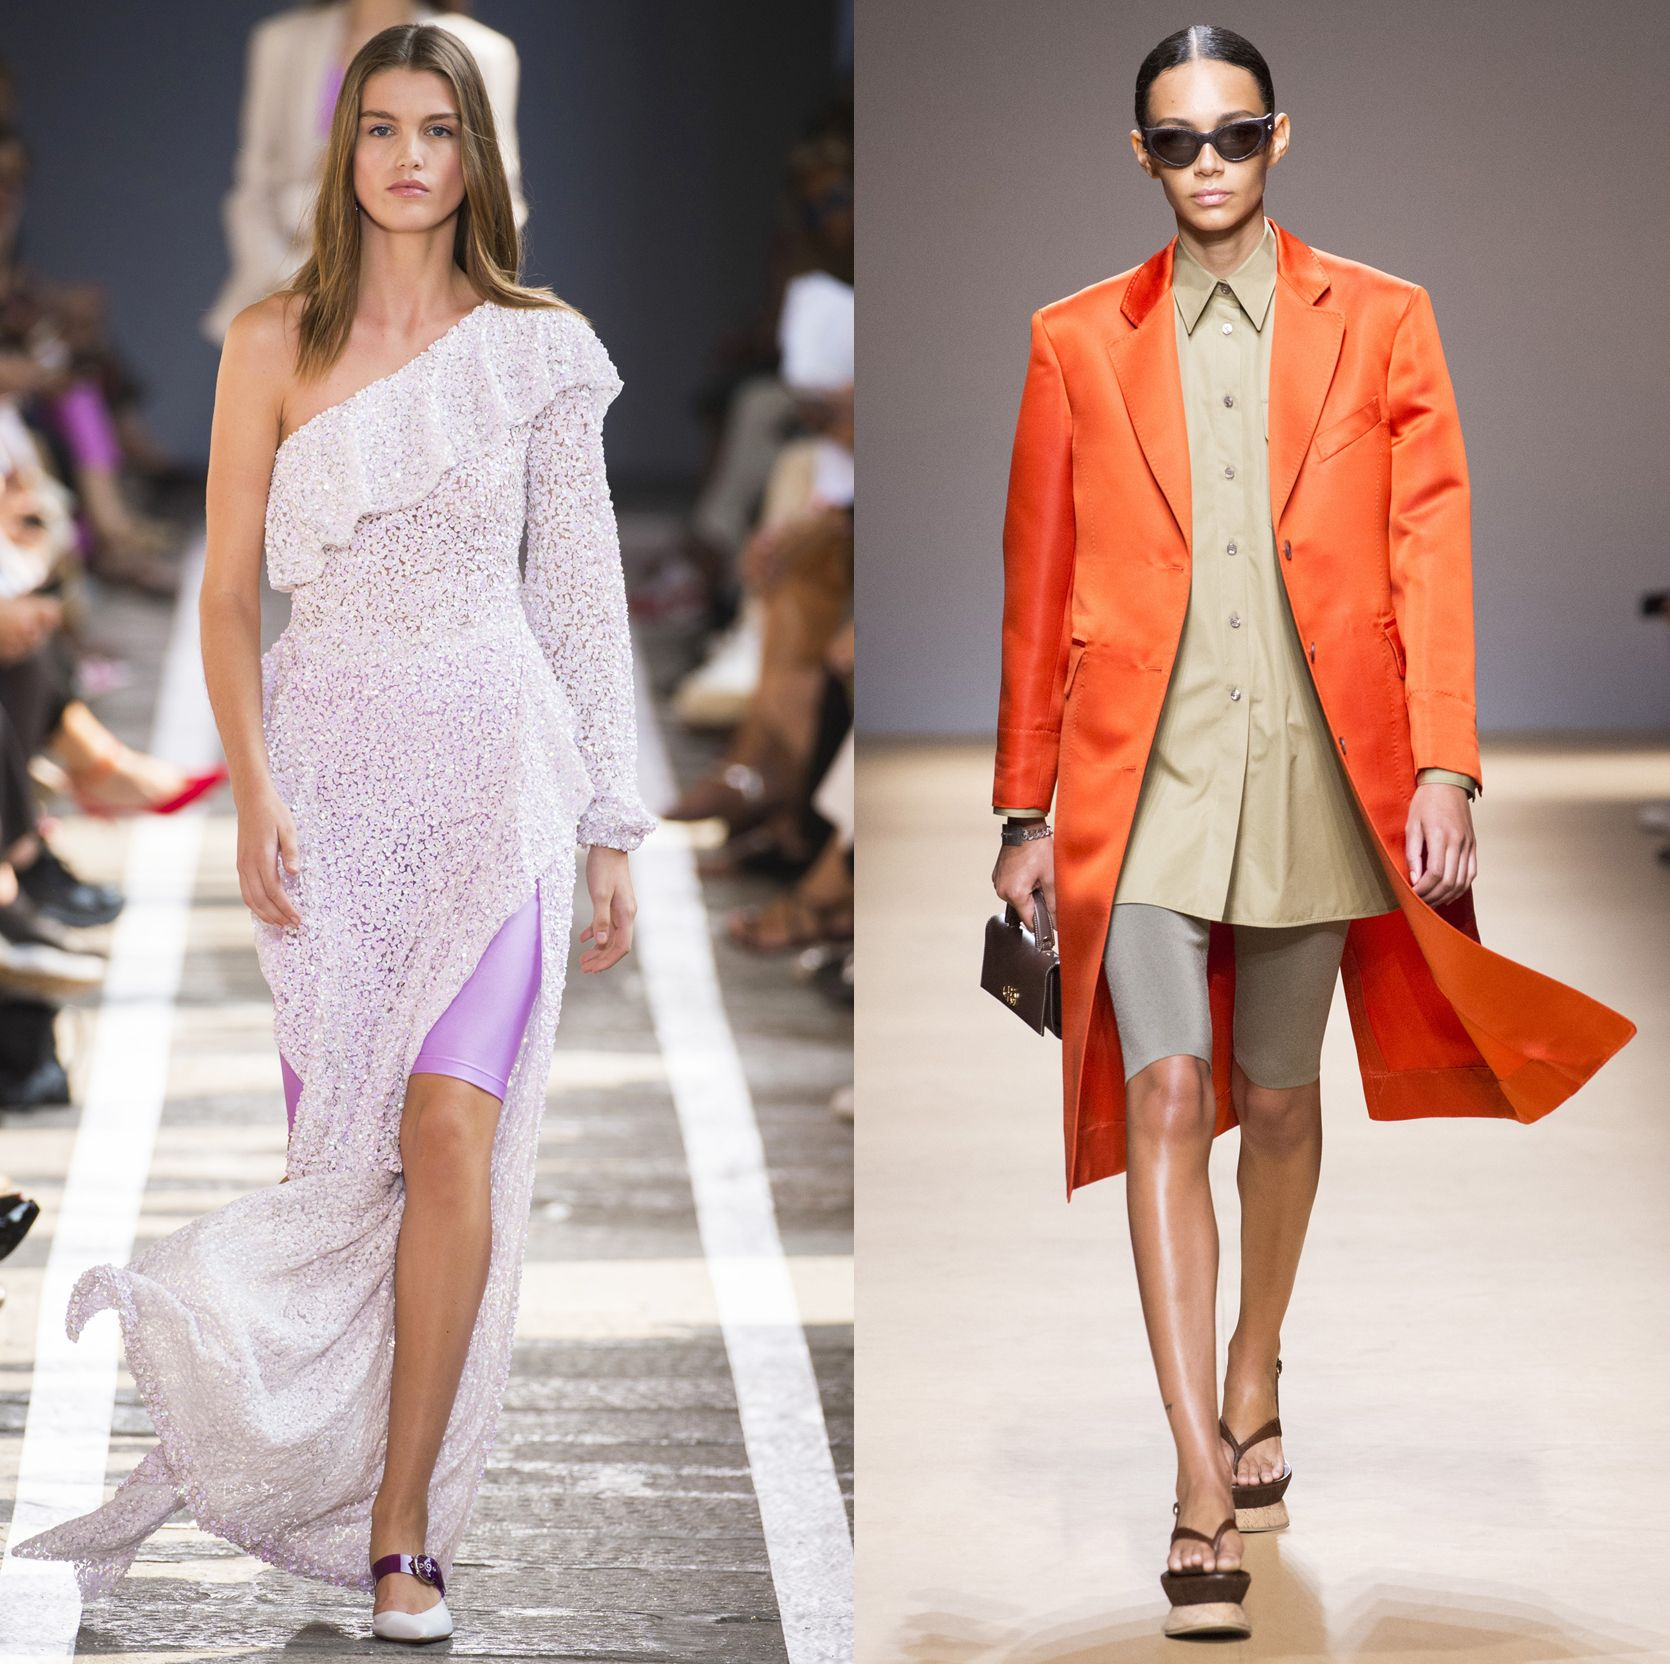 Moda E Wwvruq Le I Gonne Primavera Estate 2019 Pantaloni zqSLVGUMp